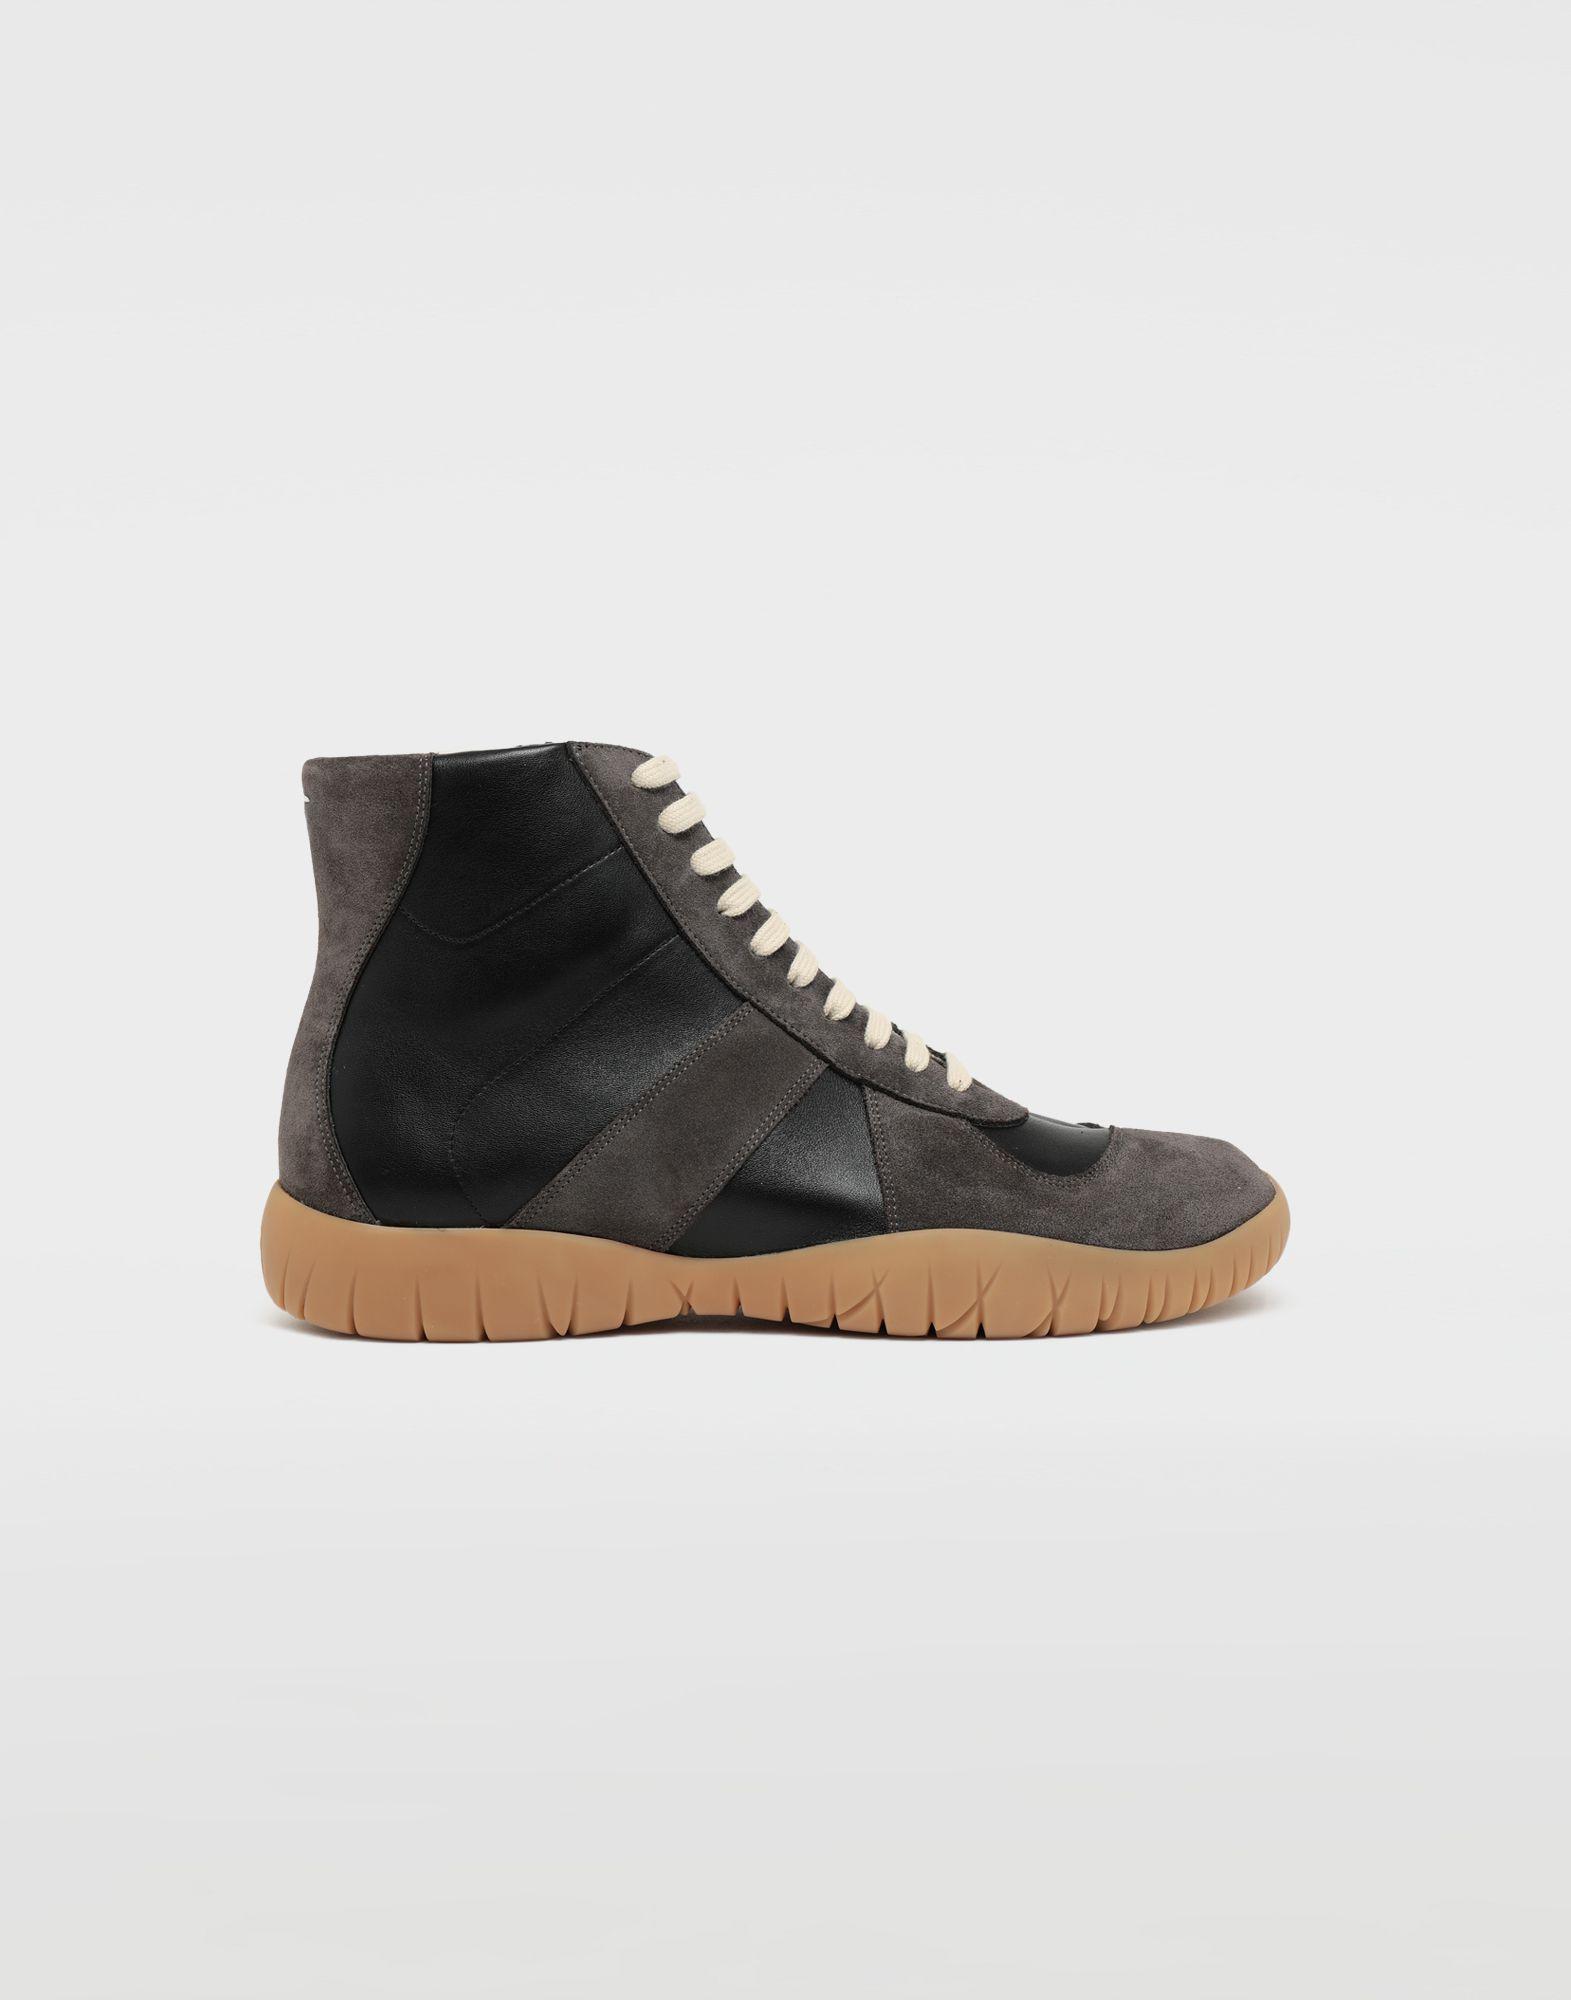 MAISON MARGIELA High-top Replica Tabi sneakers Sneakers Tabi Man f